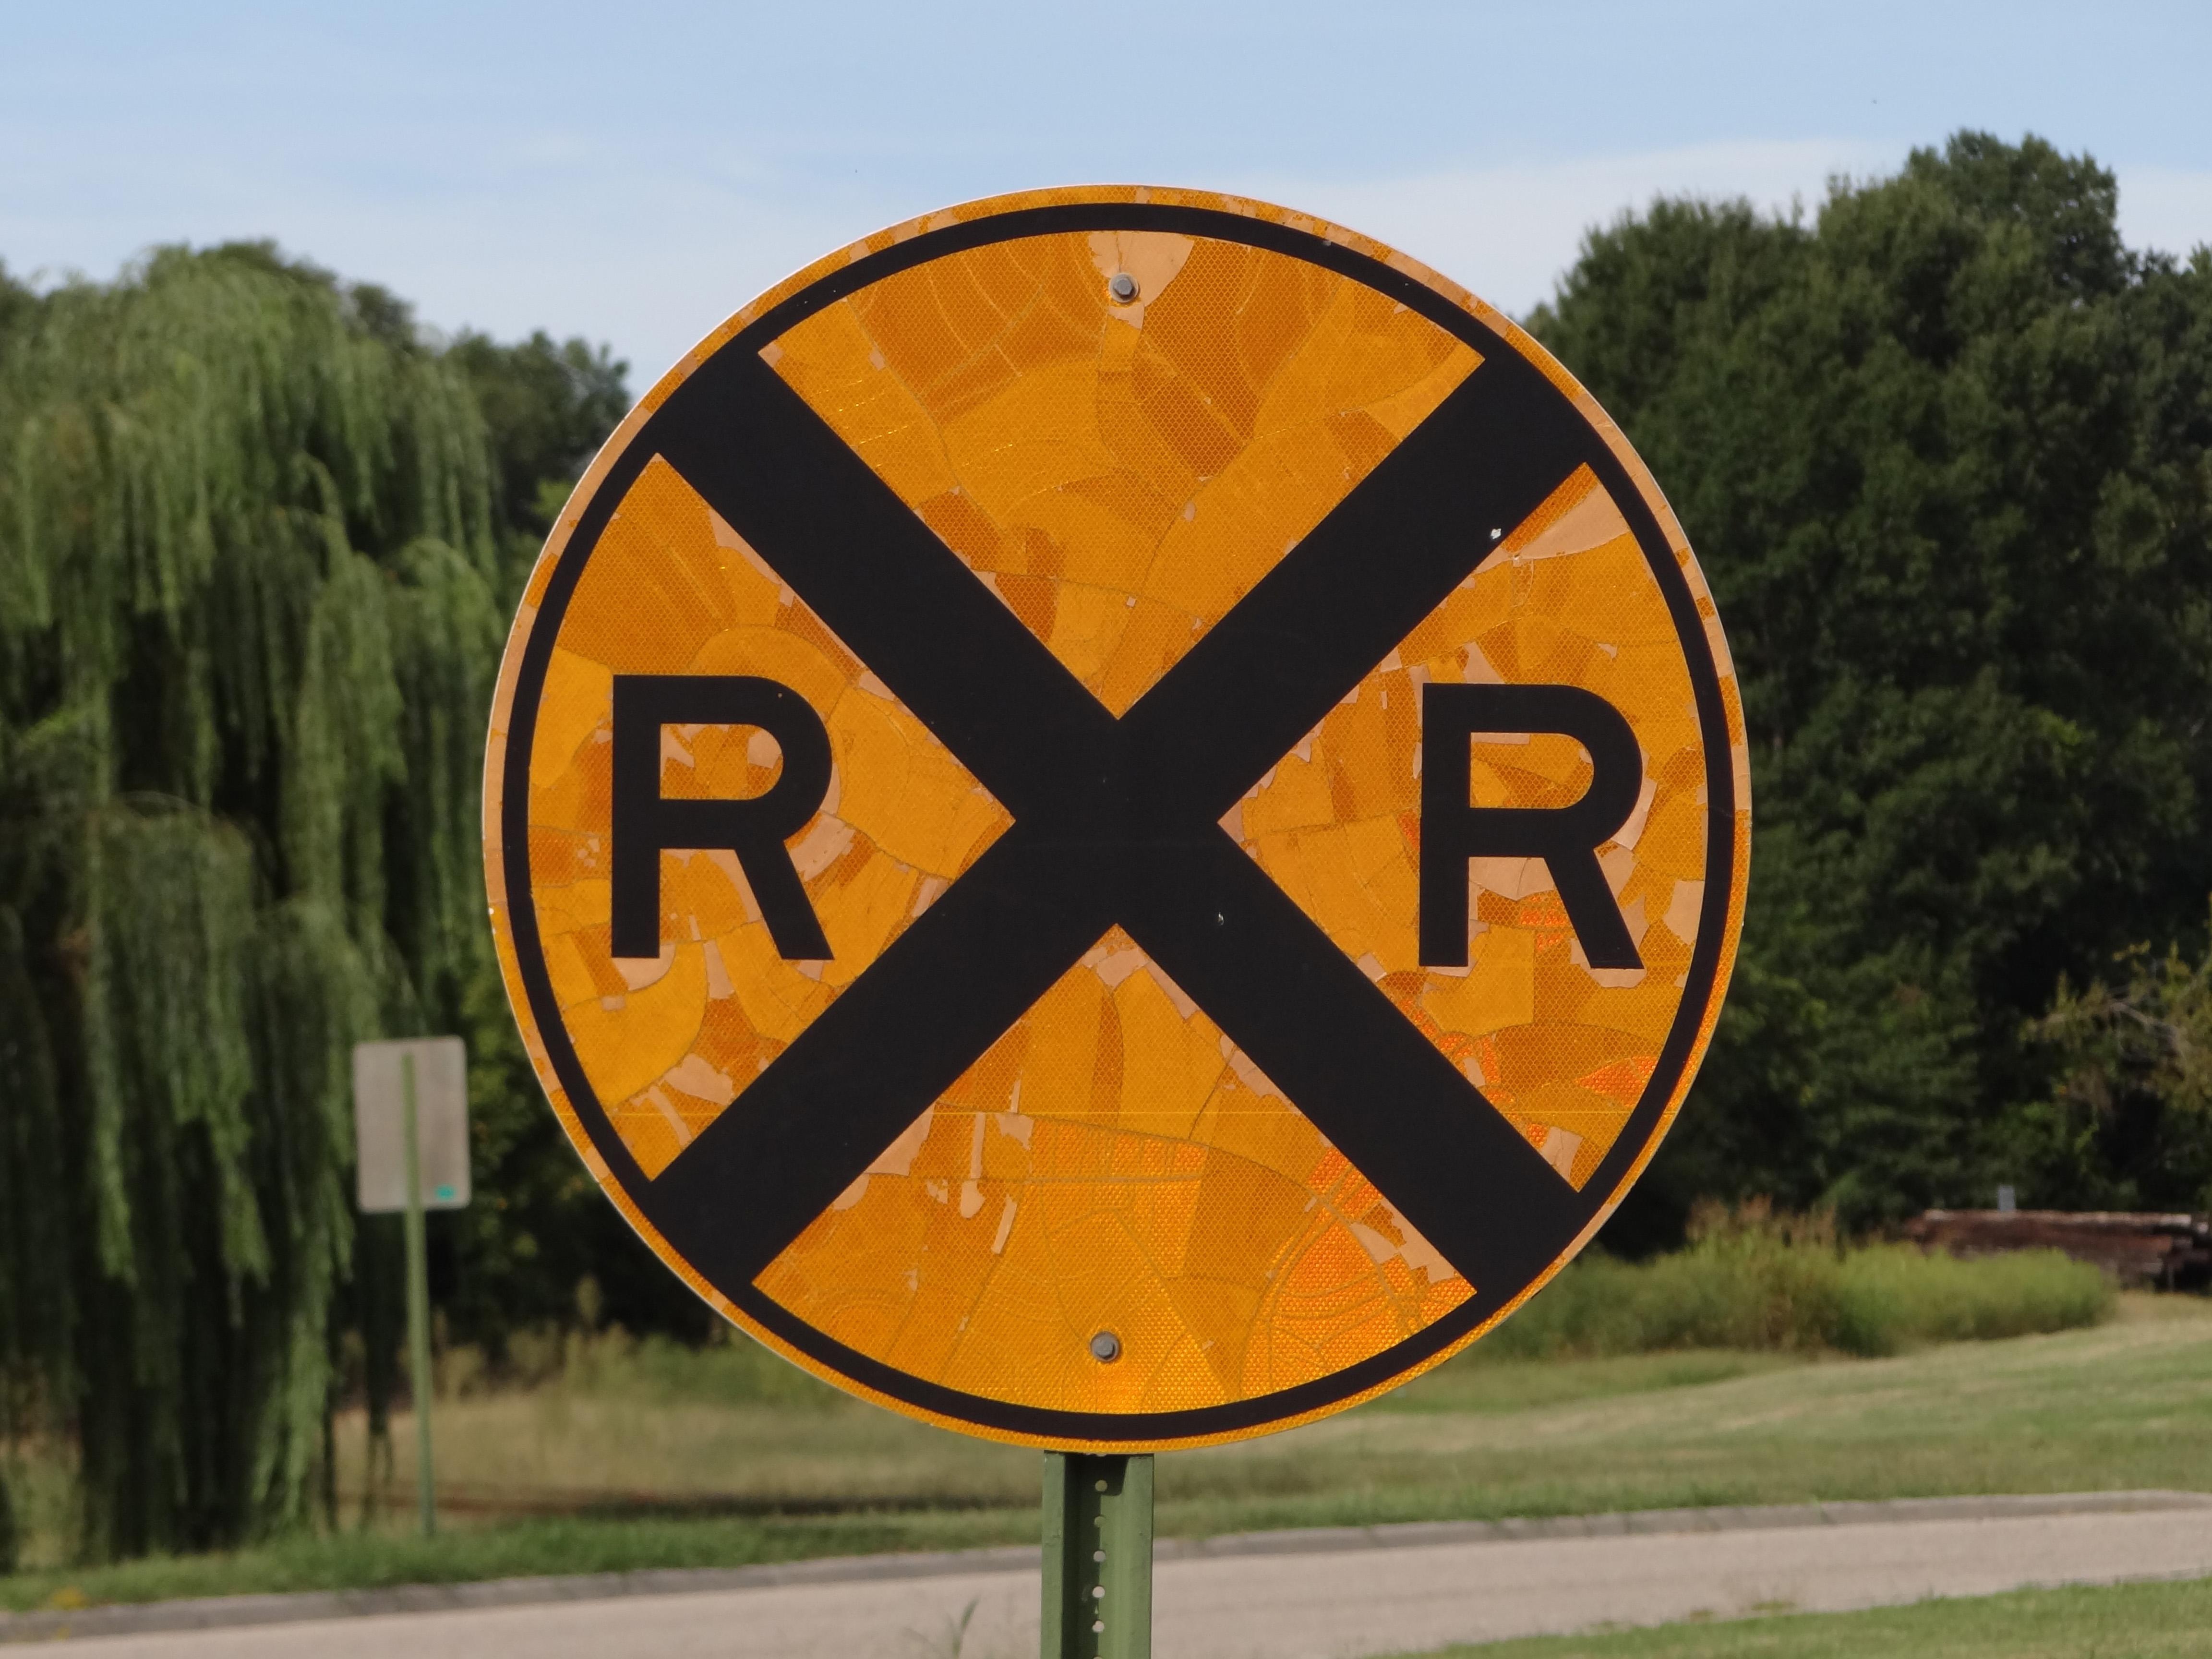 Virginia Trespassing Laws: Descriptions and Penalties